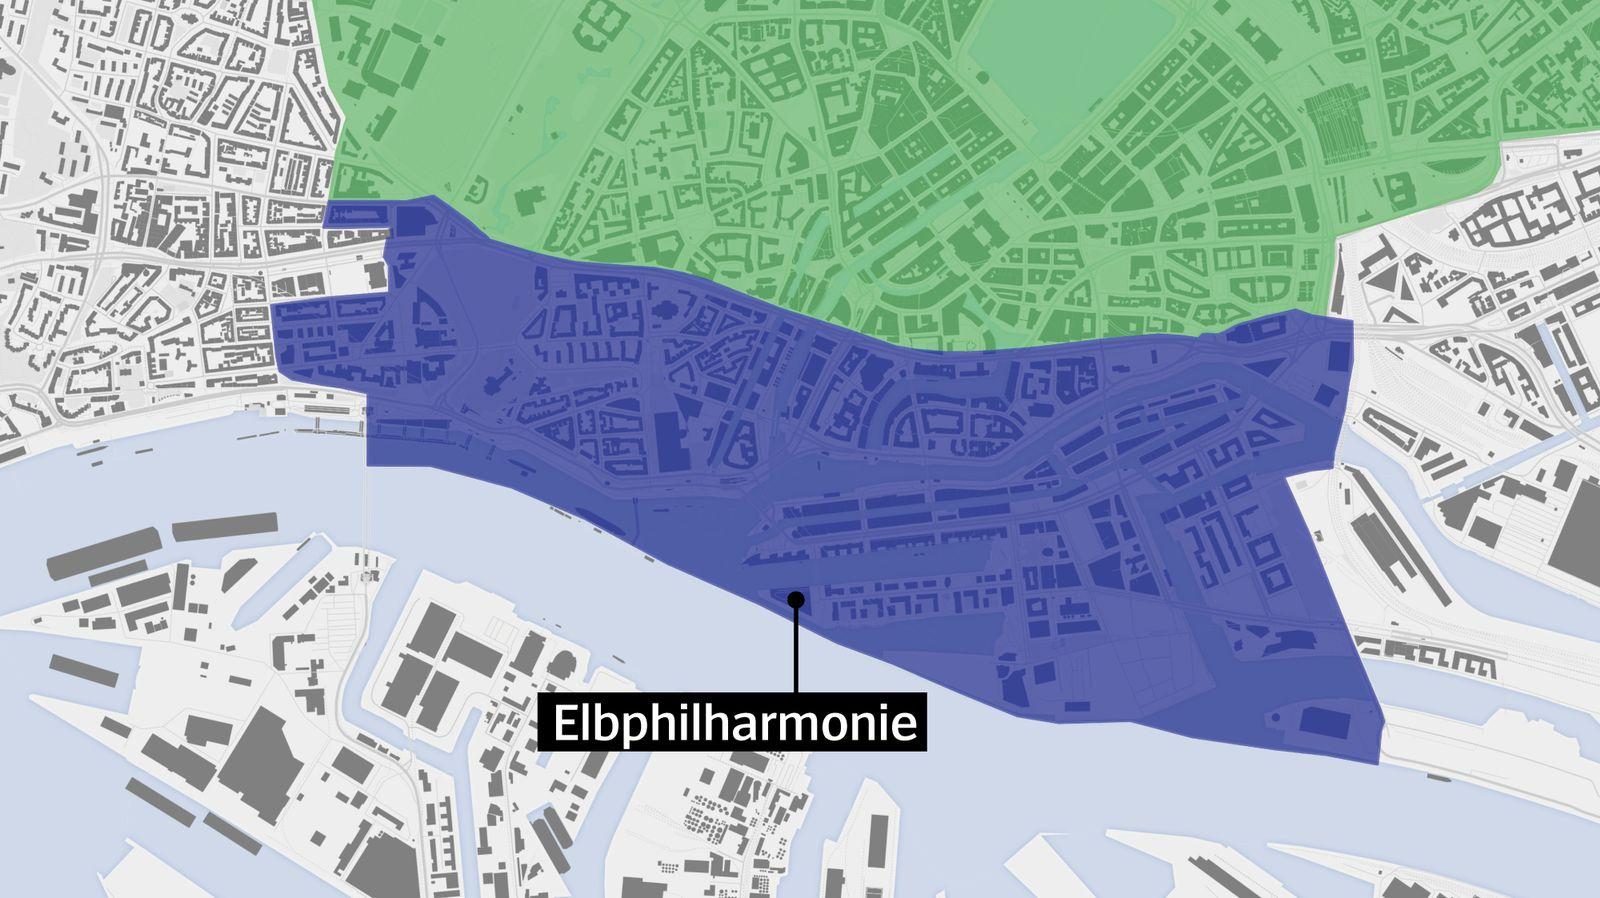 g20 Elbphilharmonie